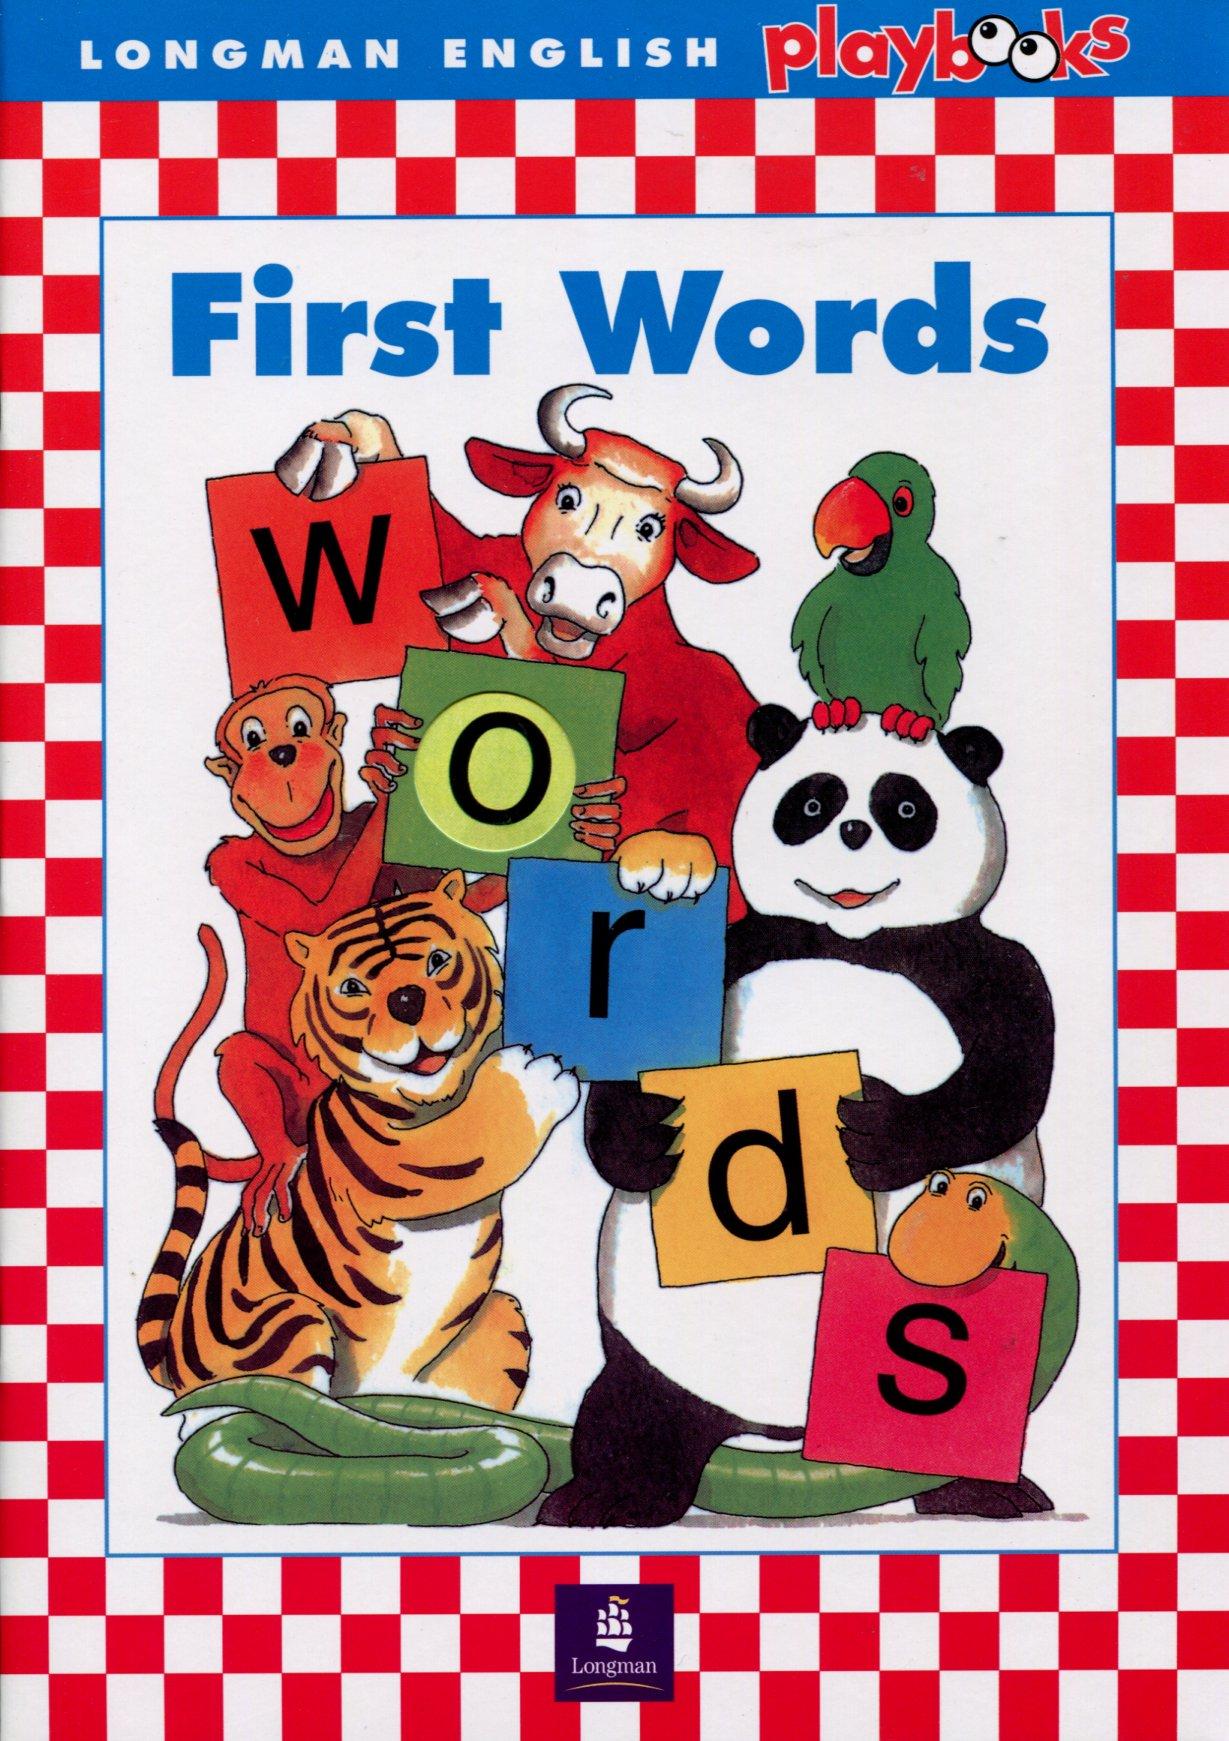 Longman English Playbooks